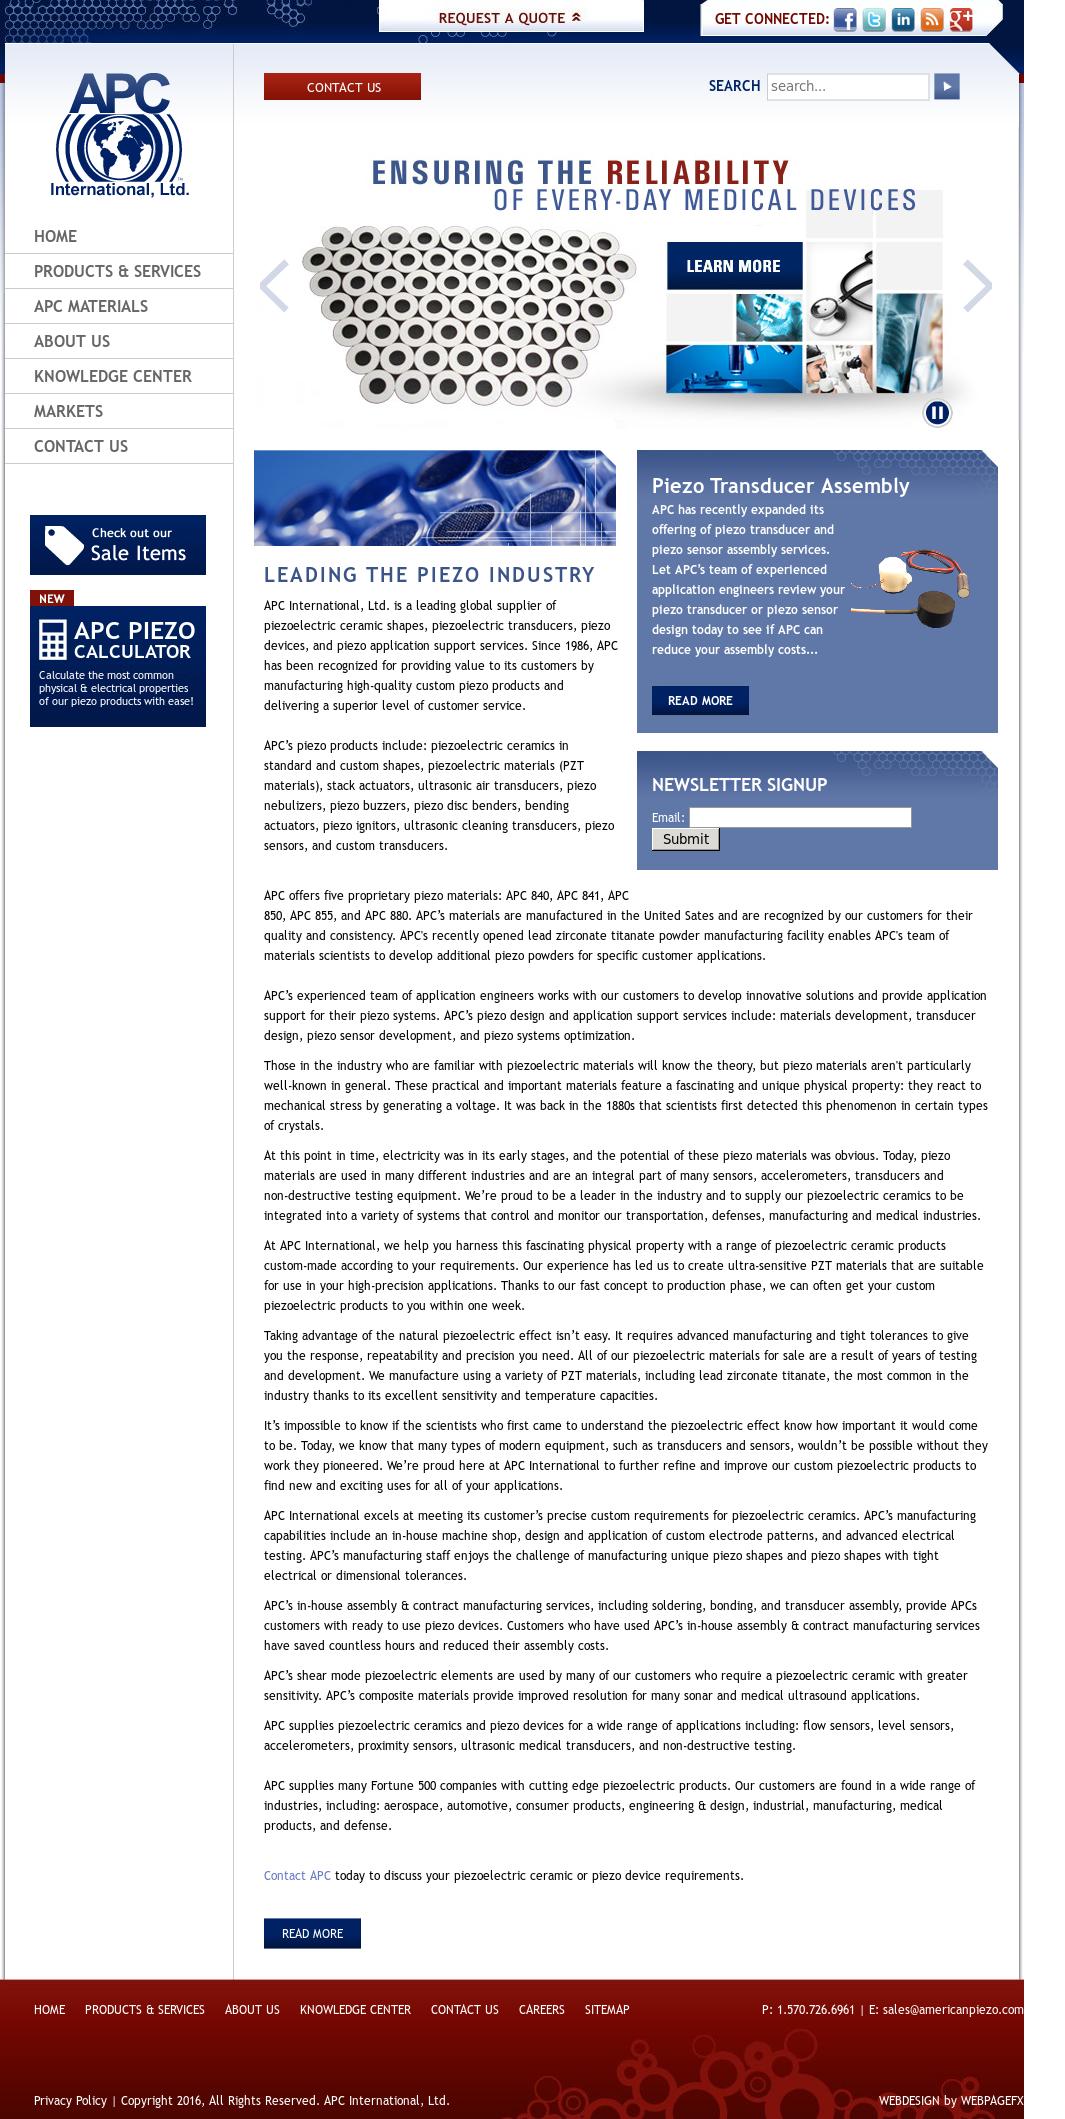 Americanpiezo Competitors, Revenue and Employees - Owler Company Profile